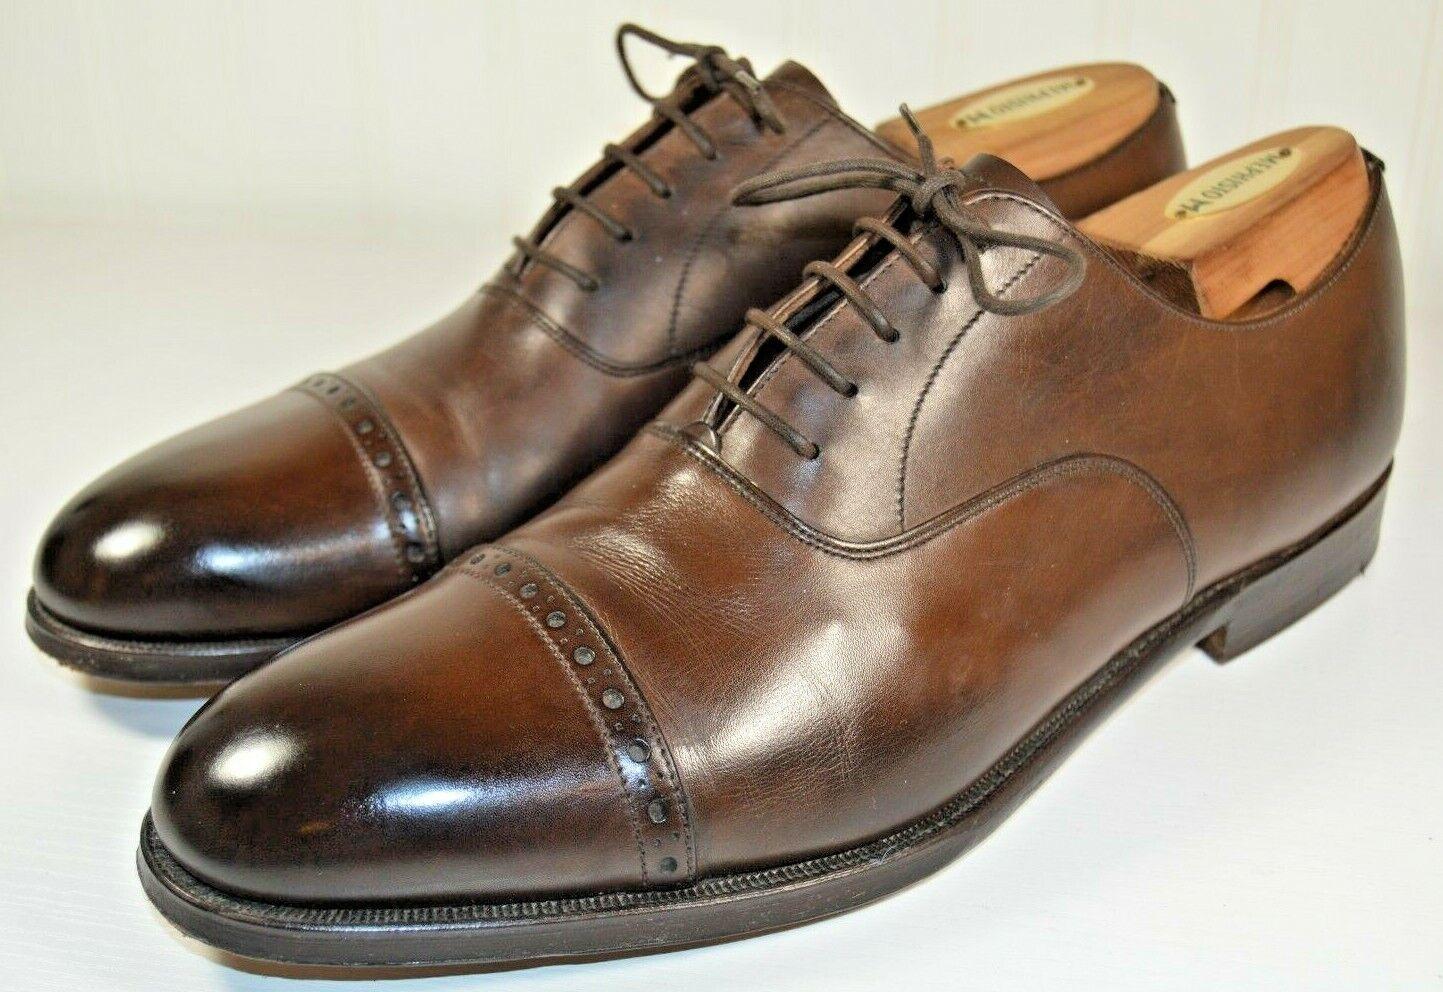 Stuarts Grenson Masterpiece D Choice Puntera Zapatos de hecho en Inglaterra